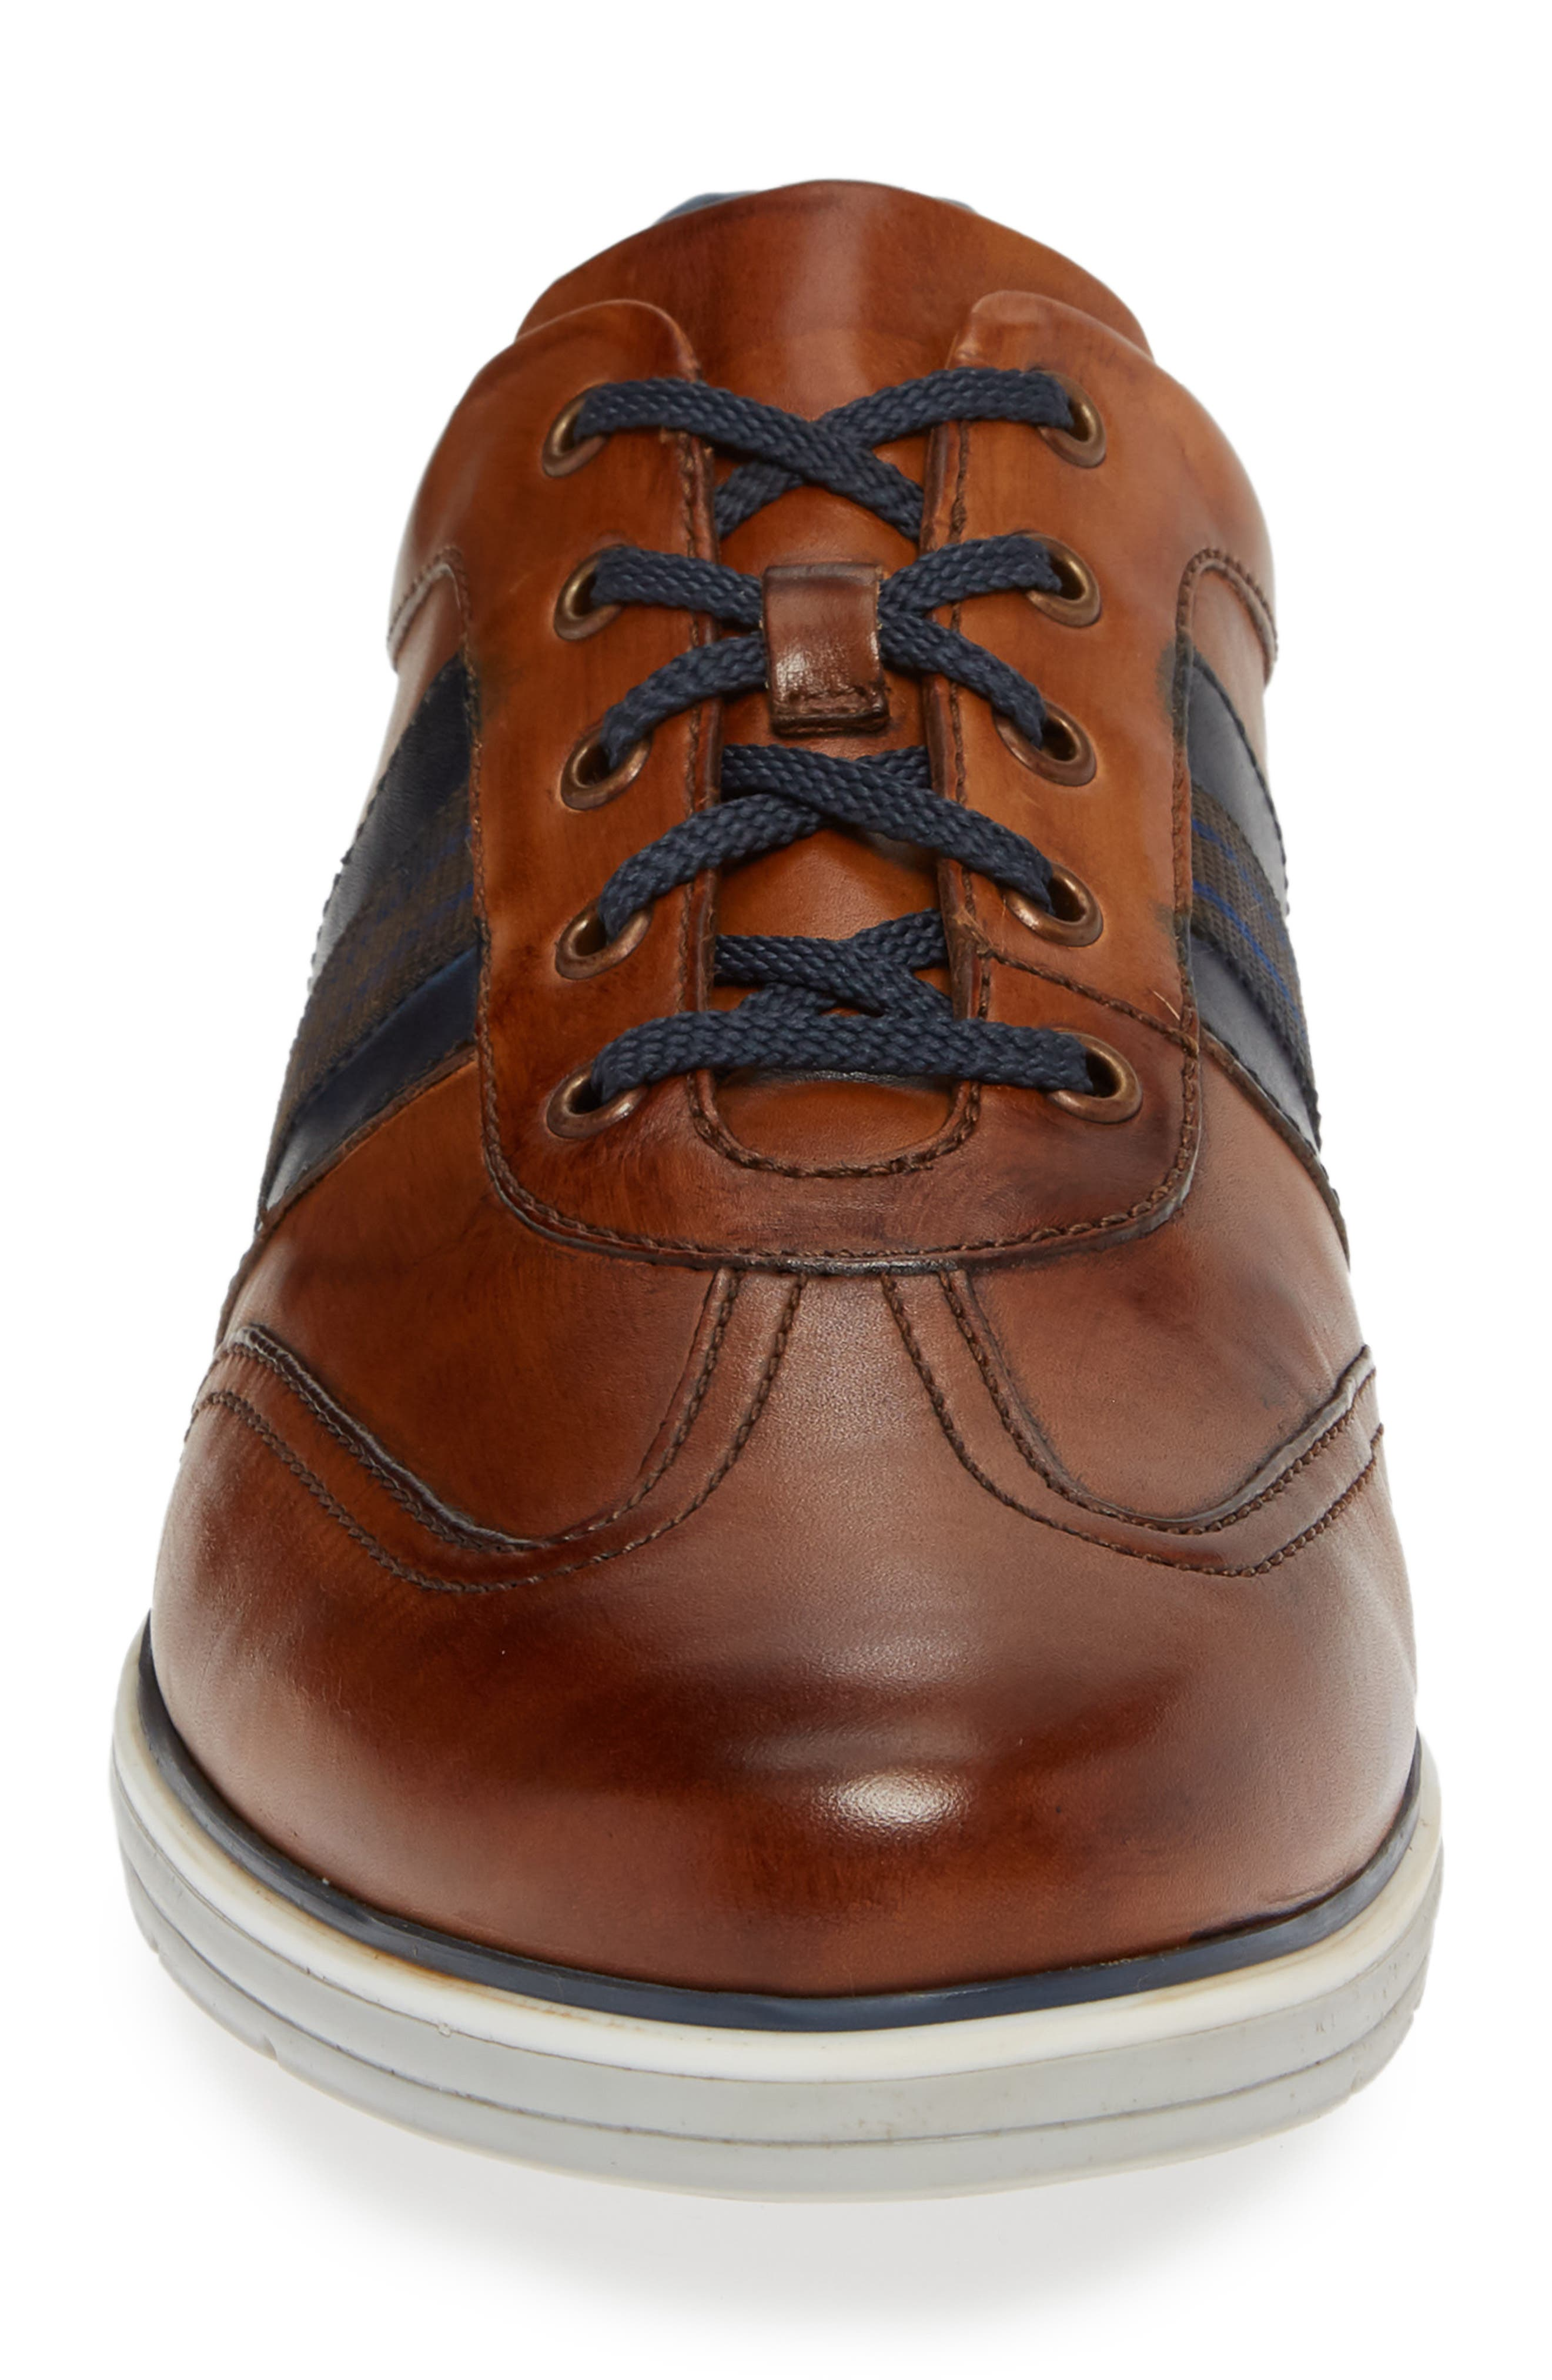 Turbo Low Top Sneaker,                             Alternate thumbnail 4, color,                             COGNAC LEATHER